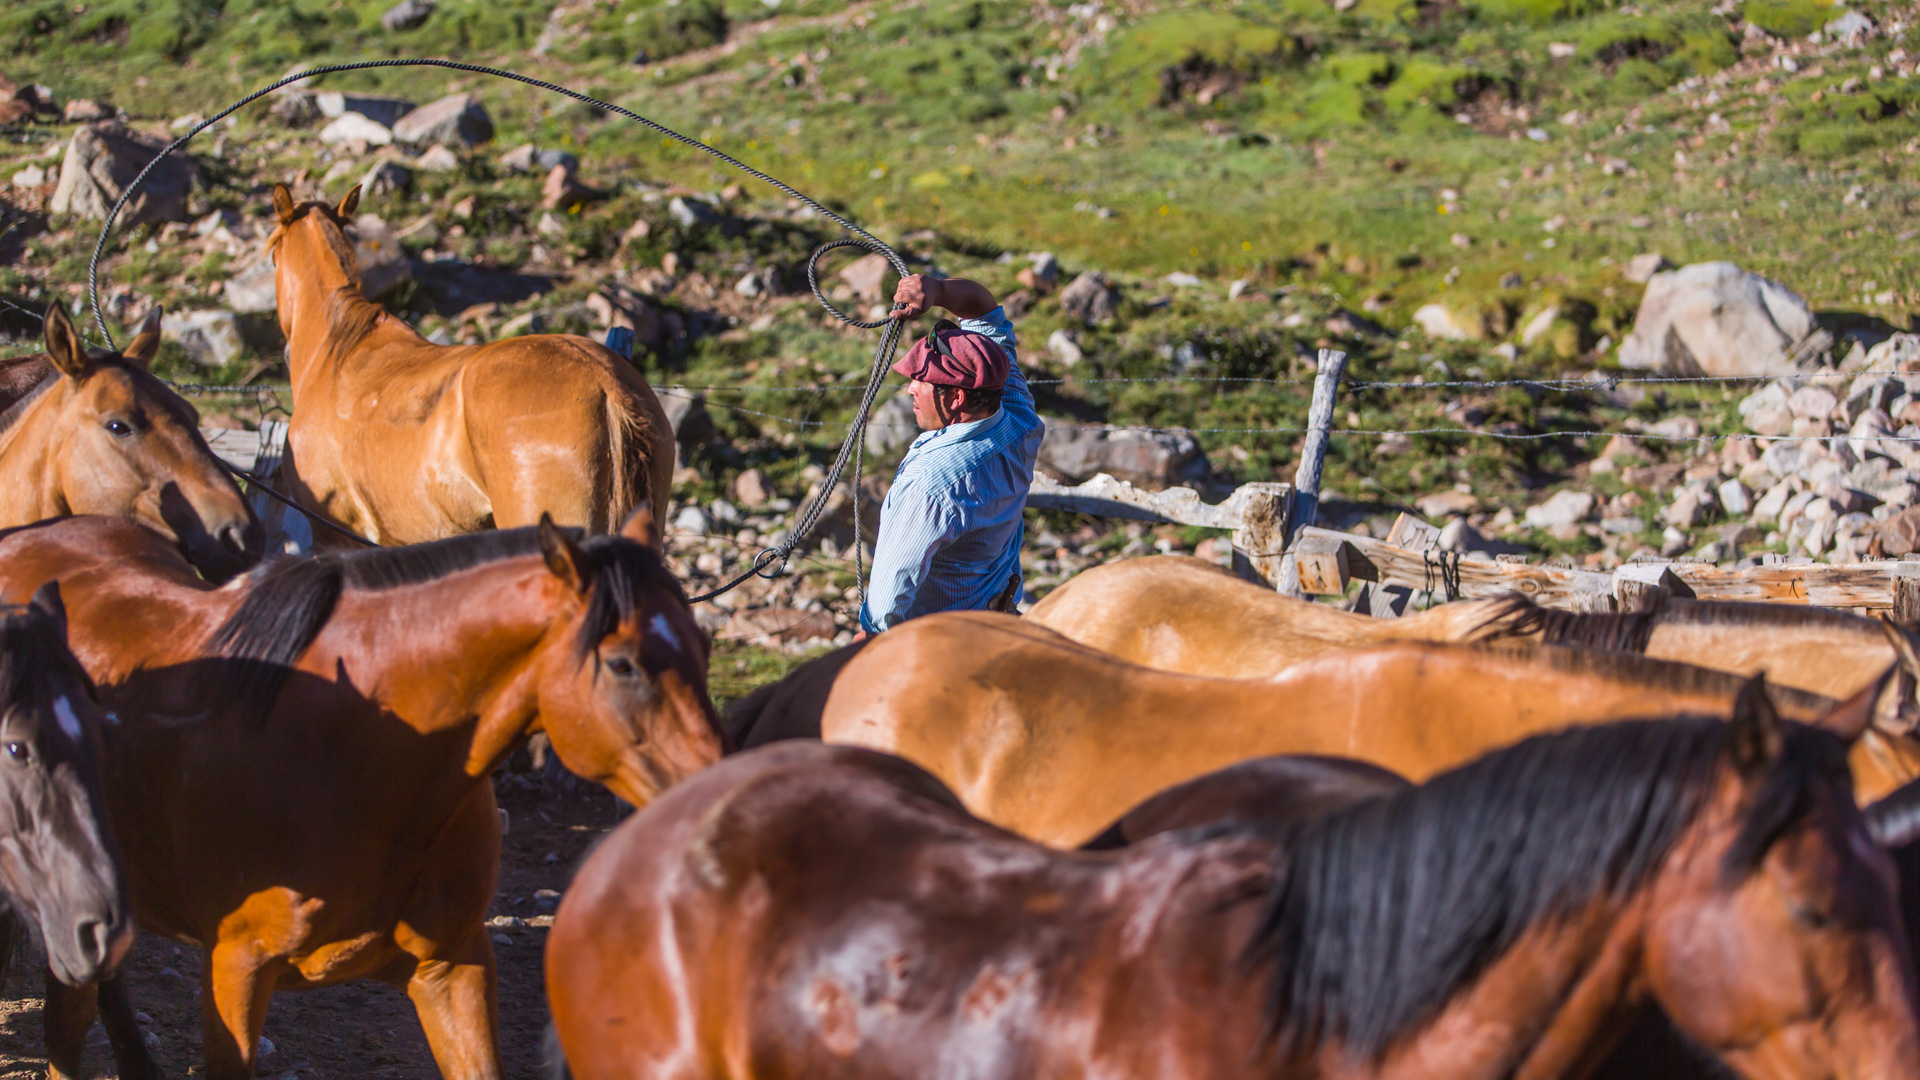 Tak gaucho łapią konie na lasso. Andes crossing